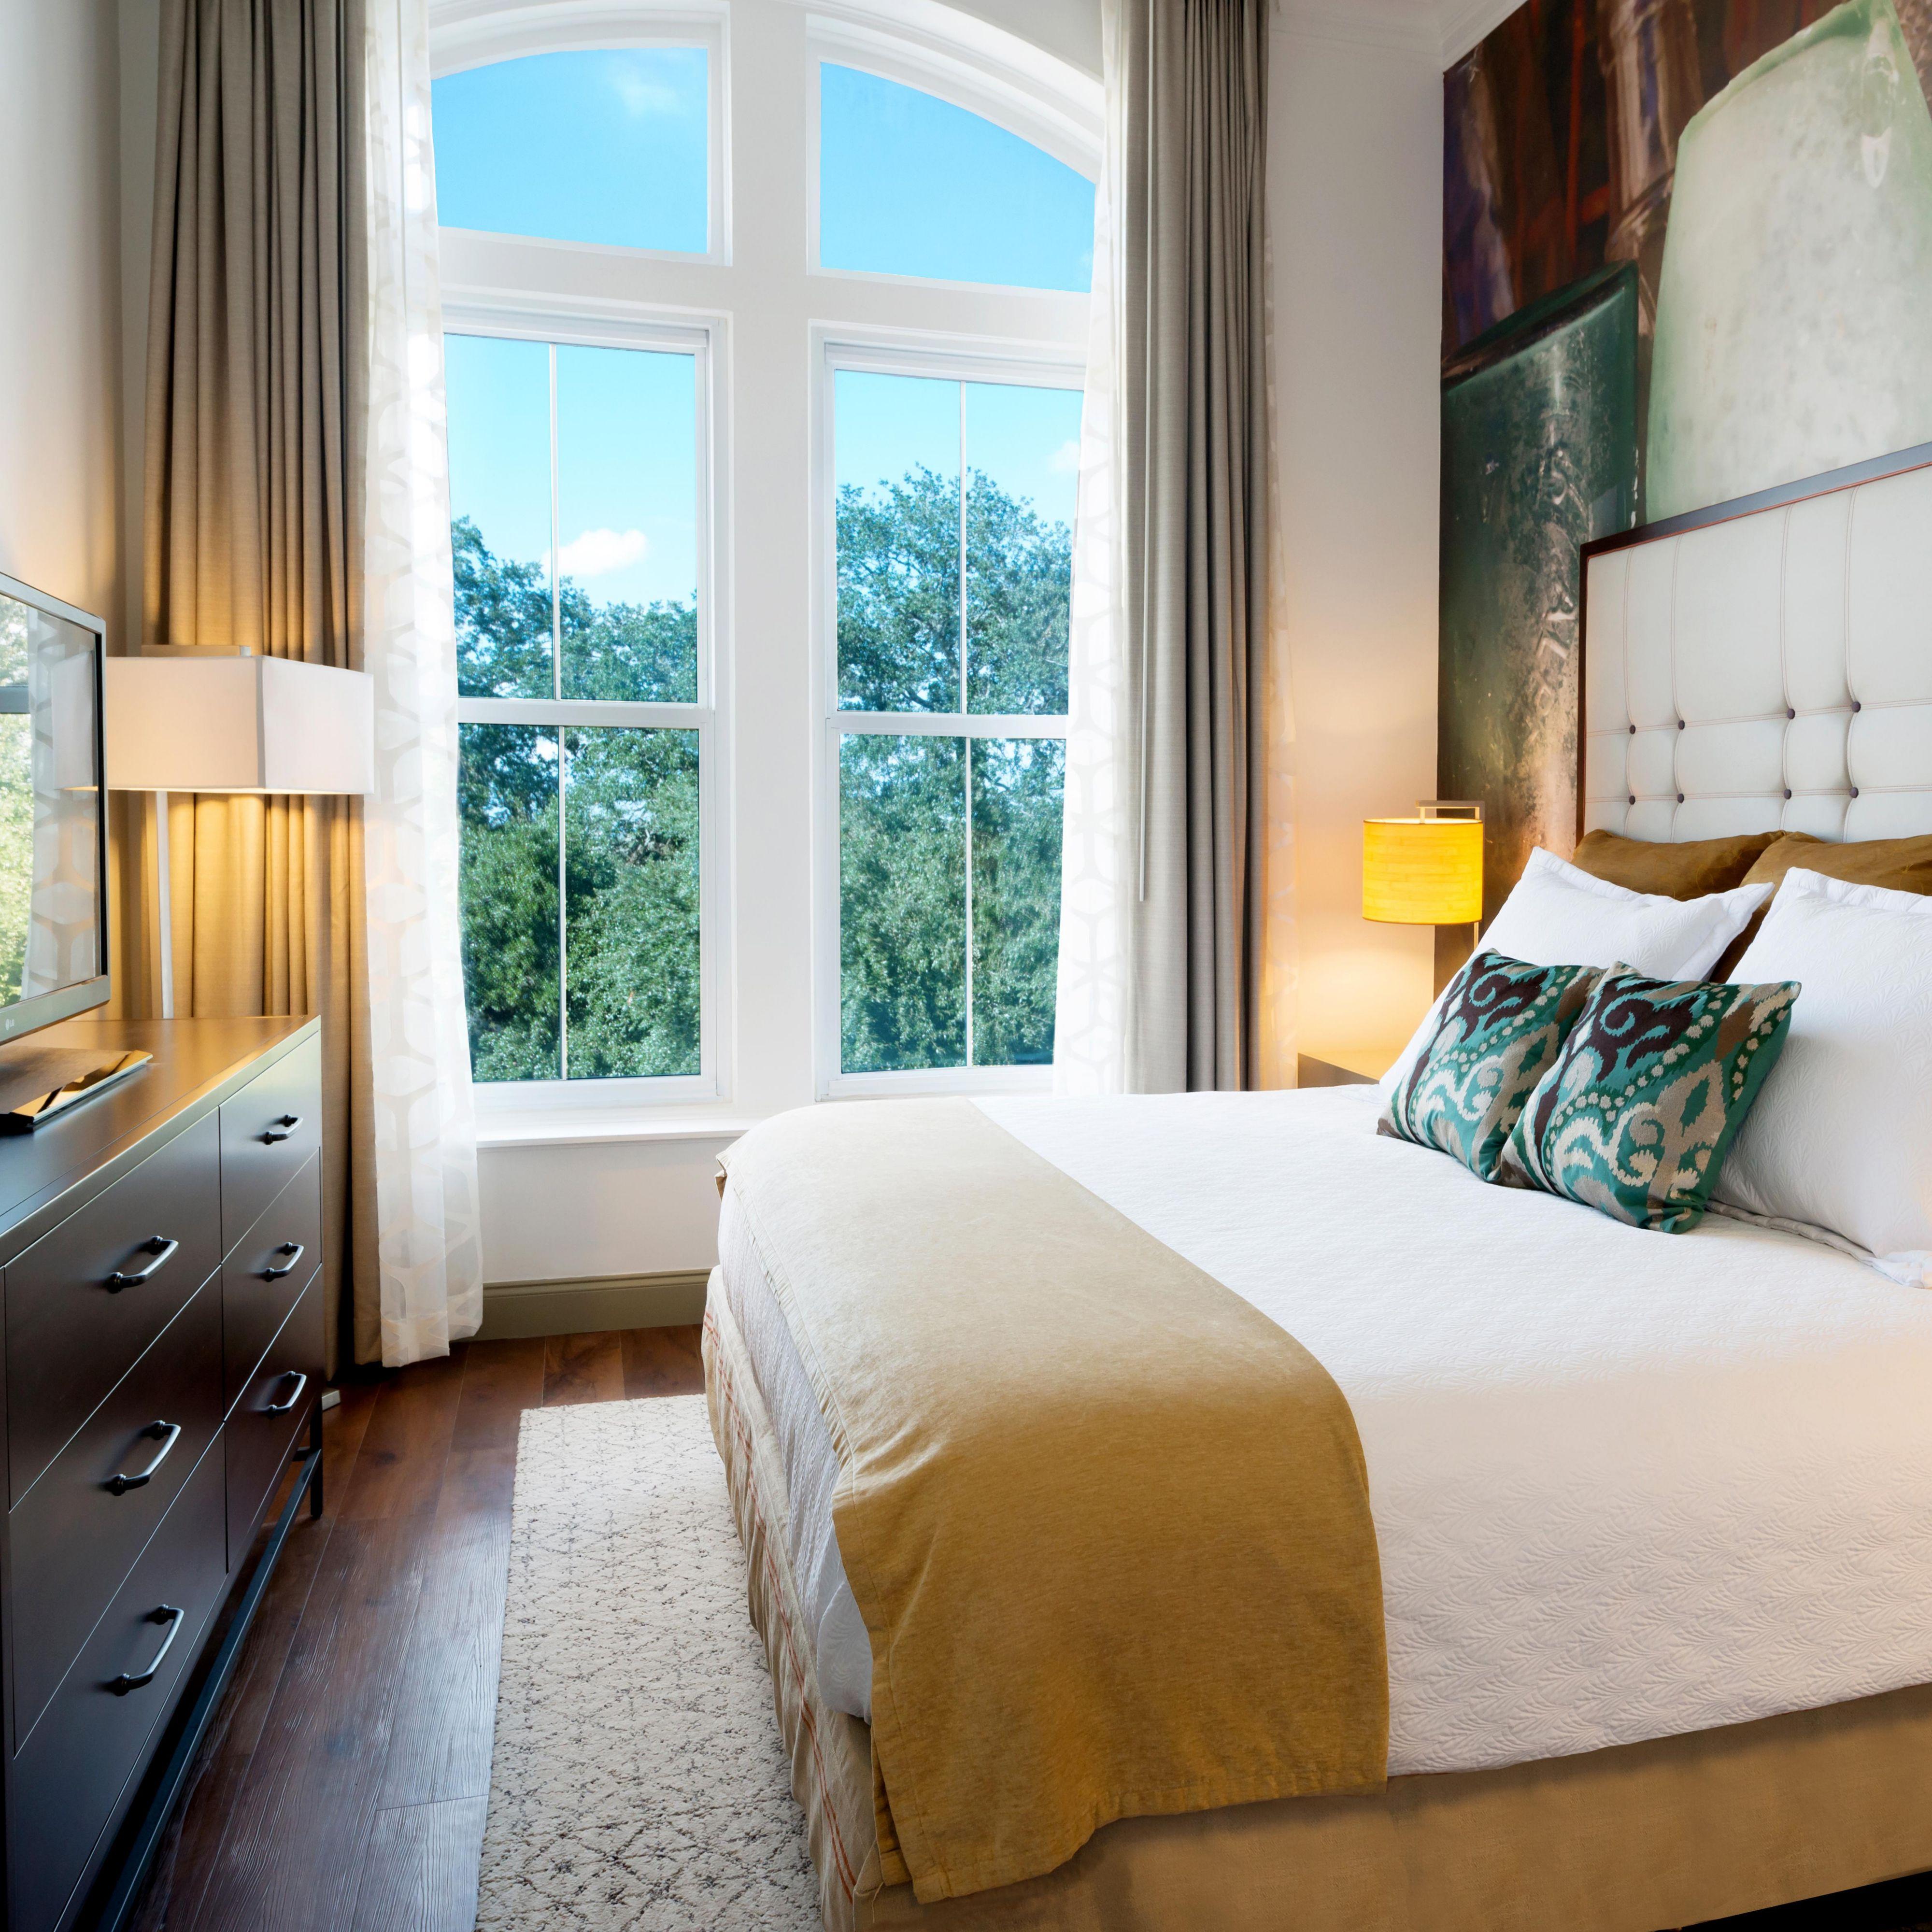 Savannah Hotels: Hotel Indigo Savannah Historic District Hotel in ...